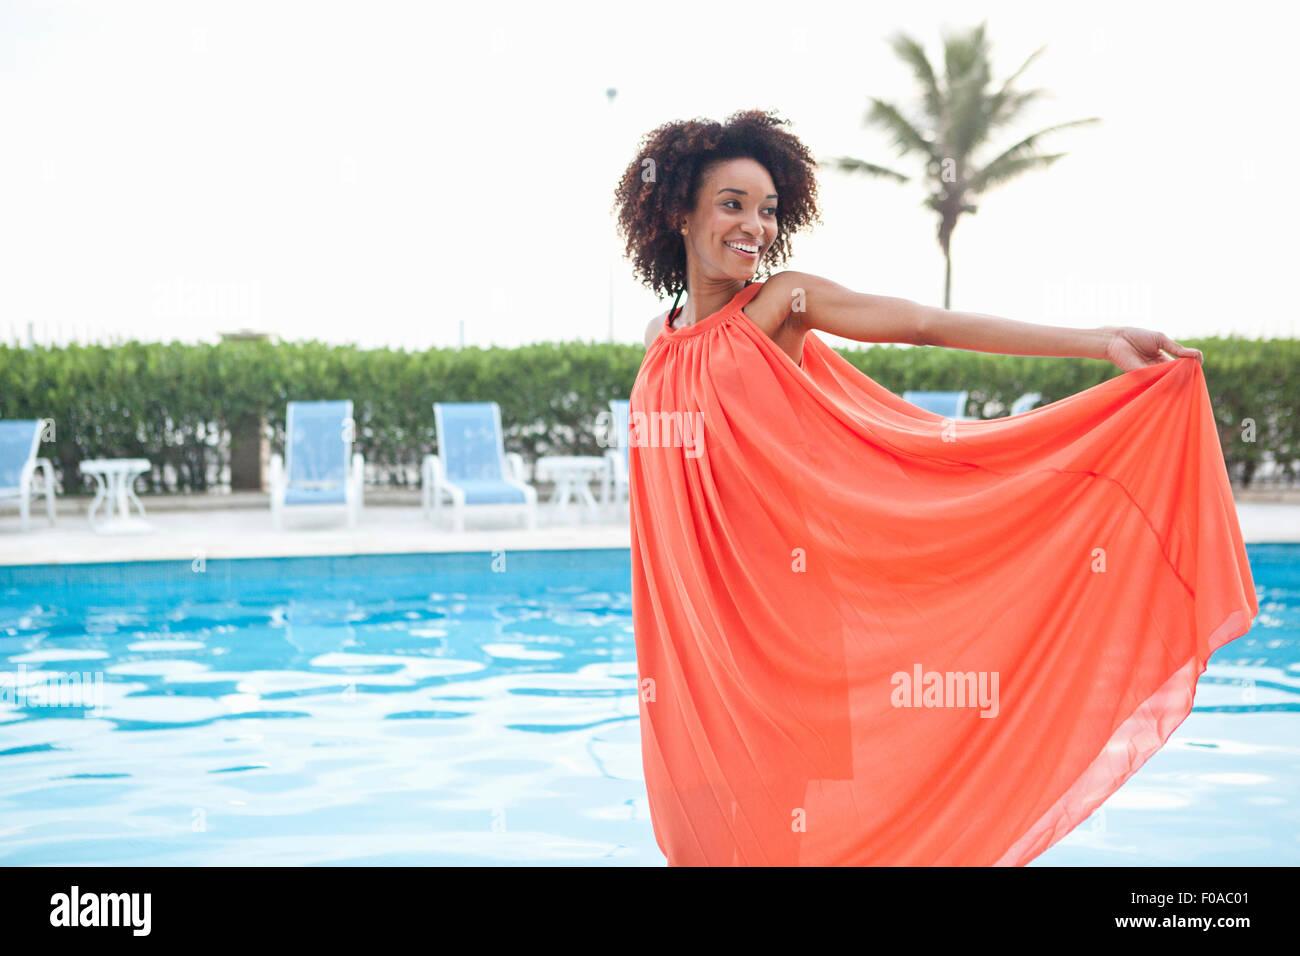 Porträt der jungen Frau trägt orange Kleid am Hotel Pool, Rio De Janeiro, Brasilien Stockbild